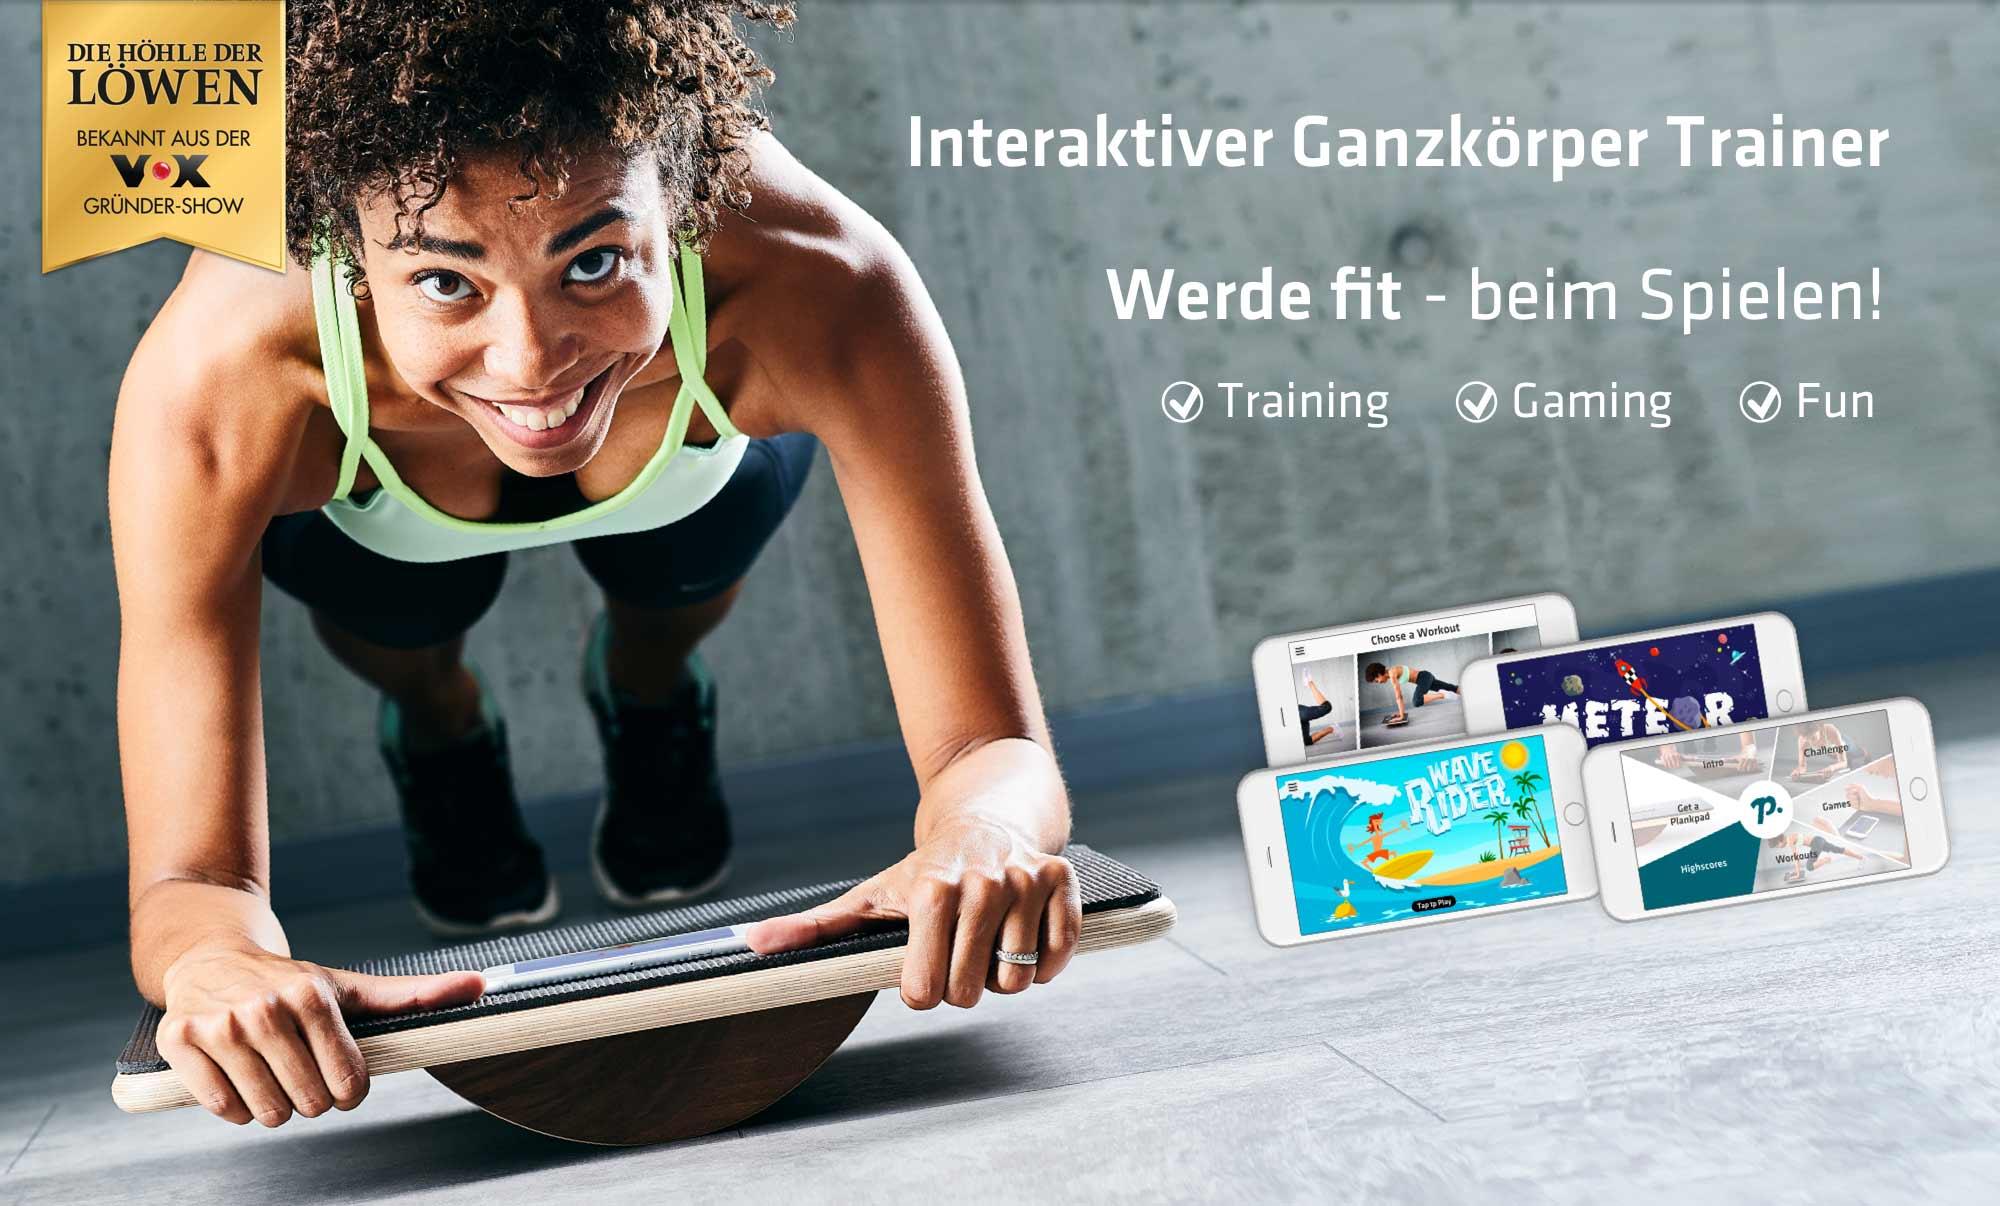 Plankpad dein interaktiver Ganzkörper Trainer